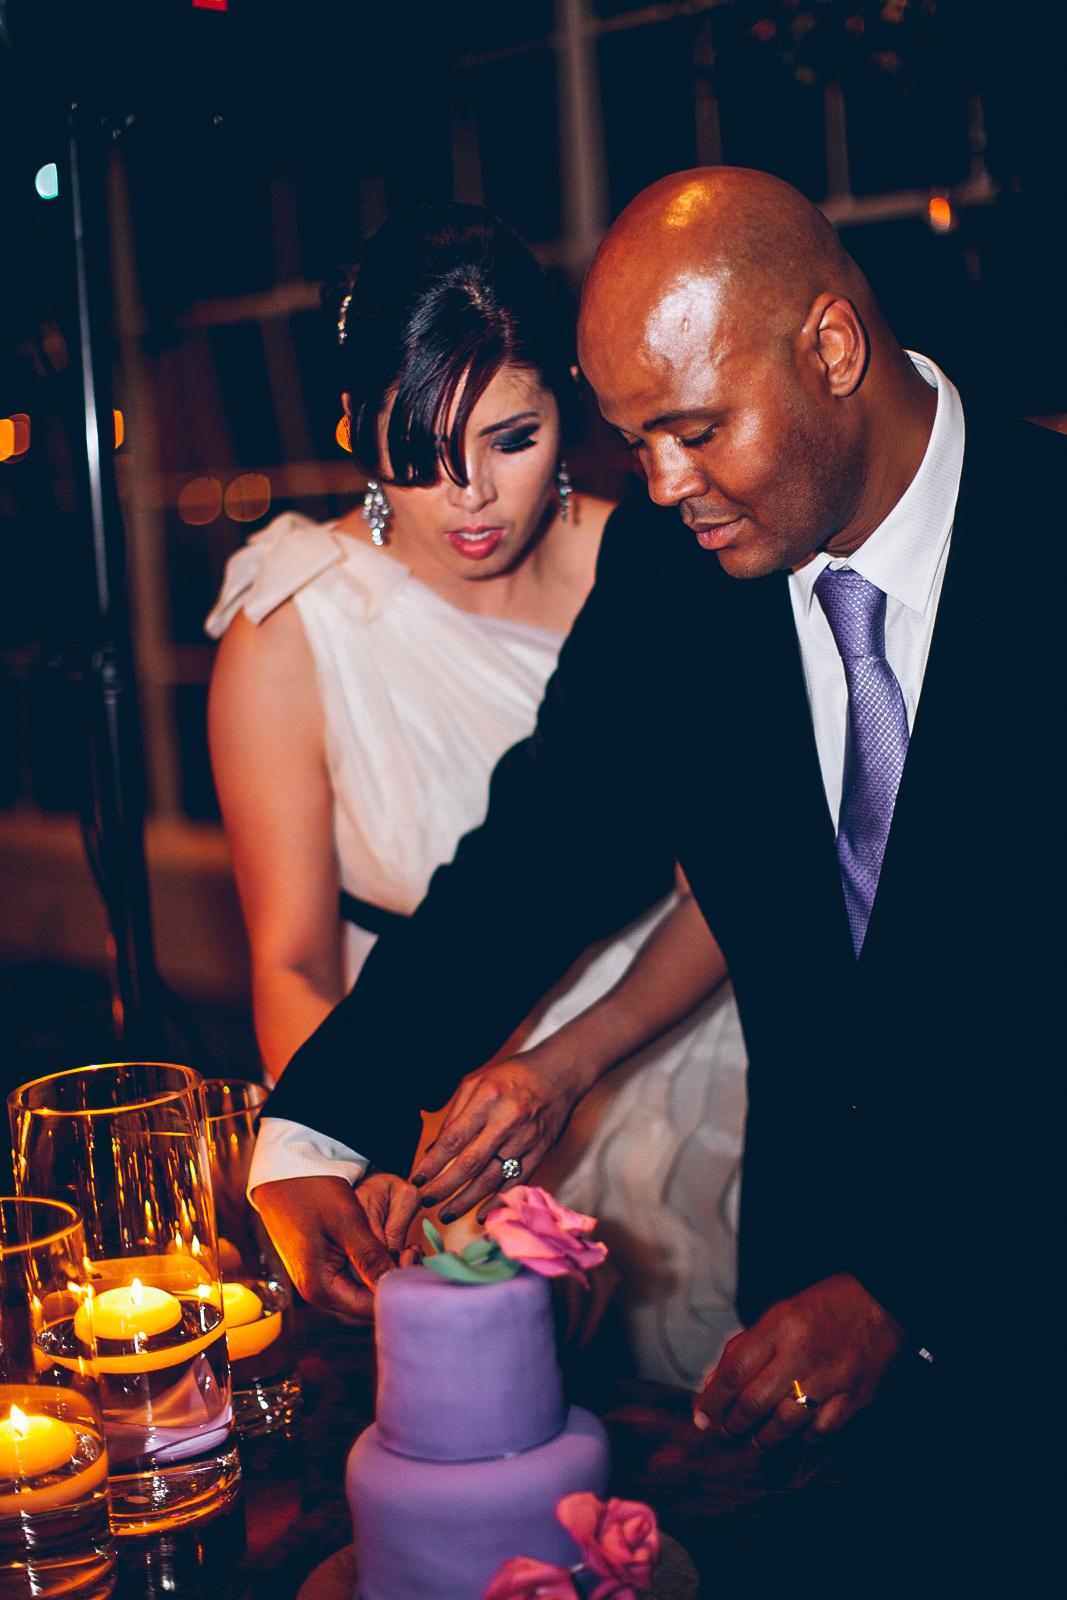 greens_restaurant_wedding_photography_san_franscisco_ebony_siovhan_bokeh_photography_77.jpg